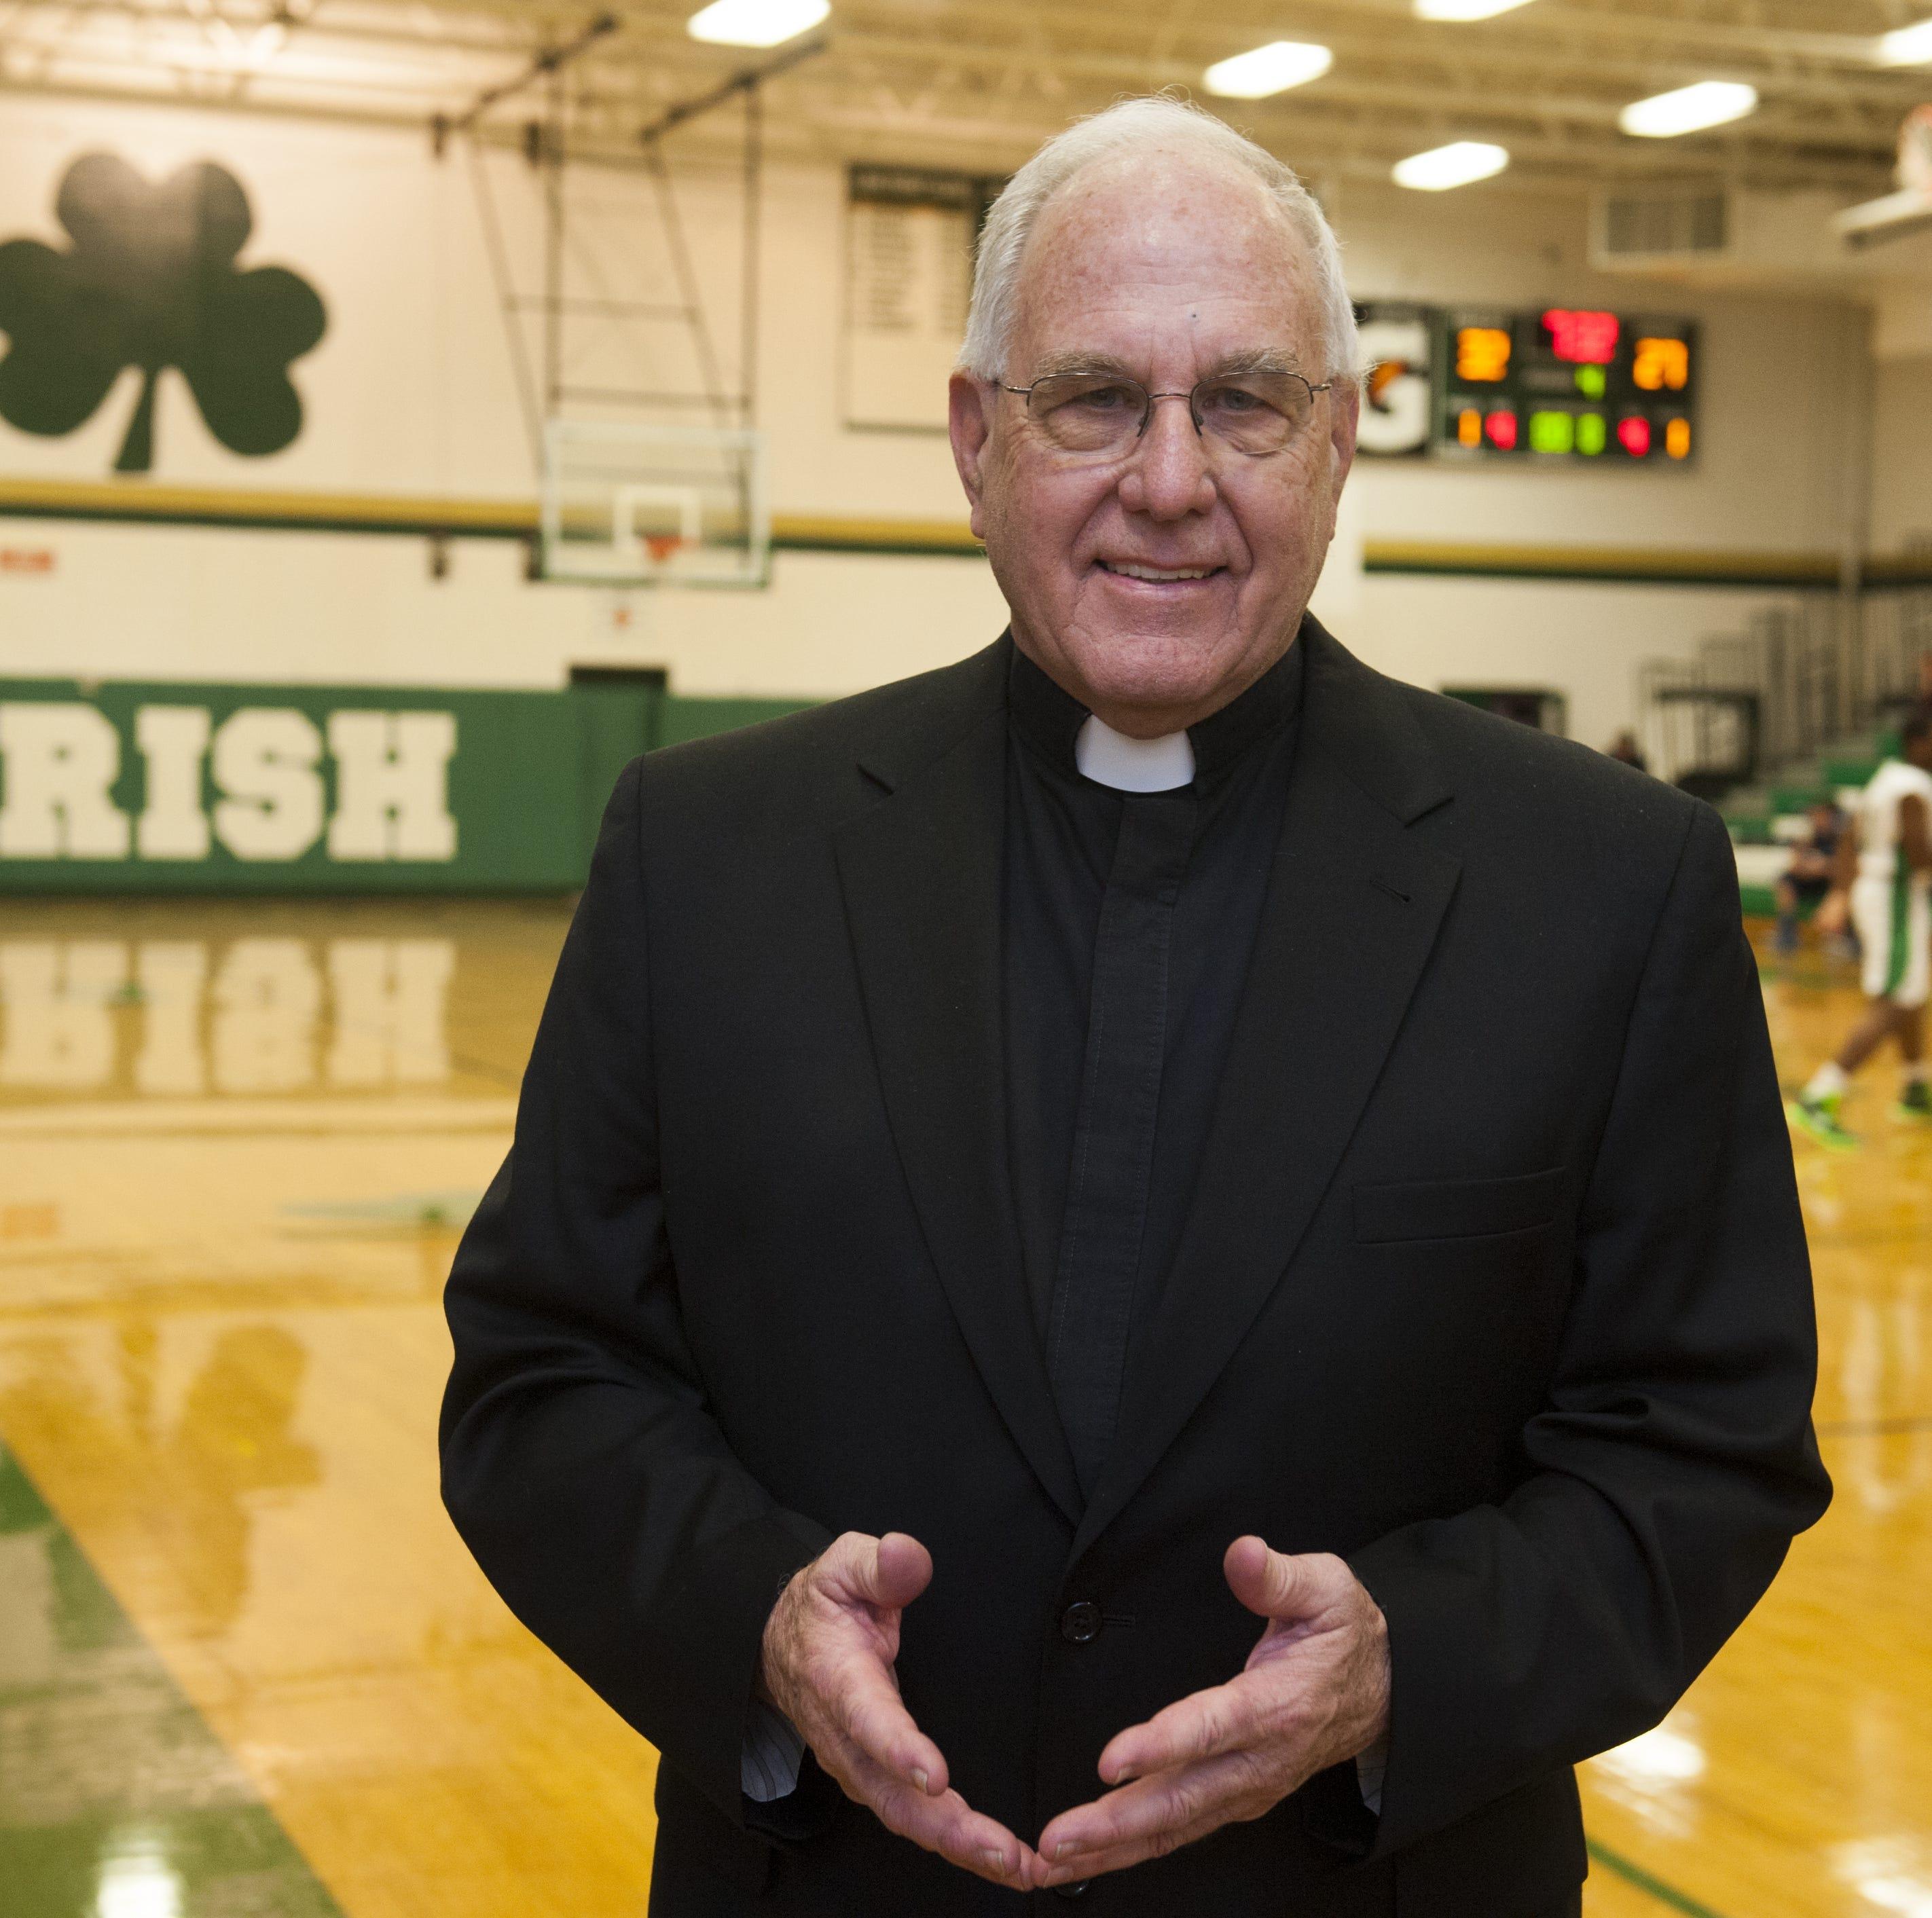 McDermott, Camden native, priest, recalled as 'star in the East'